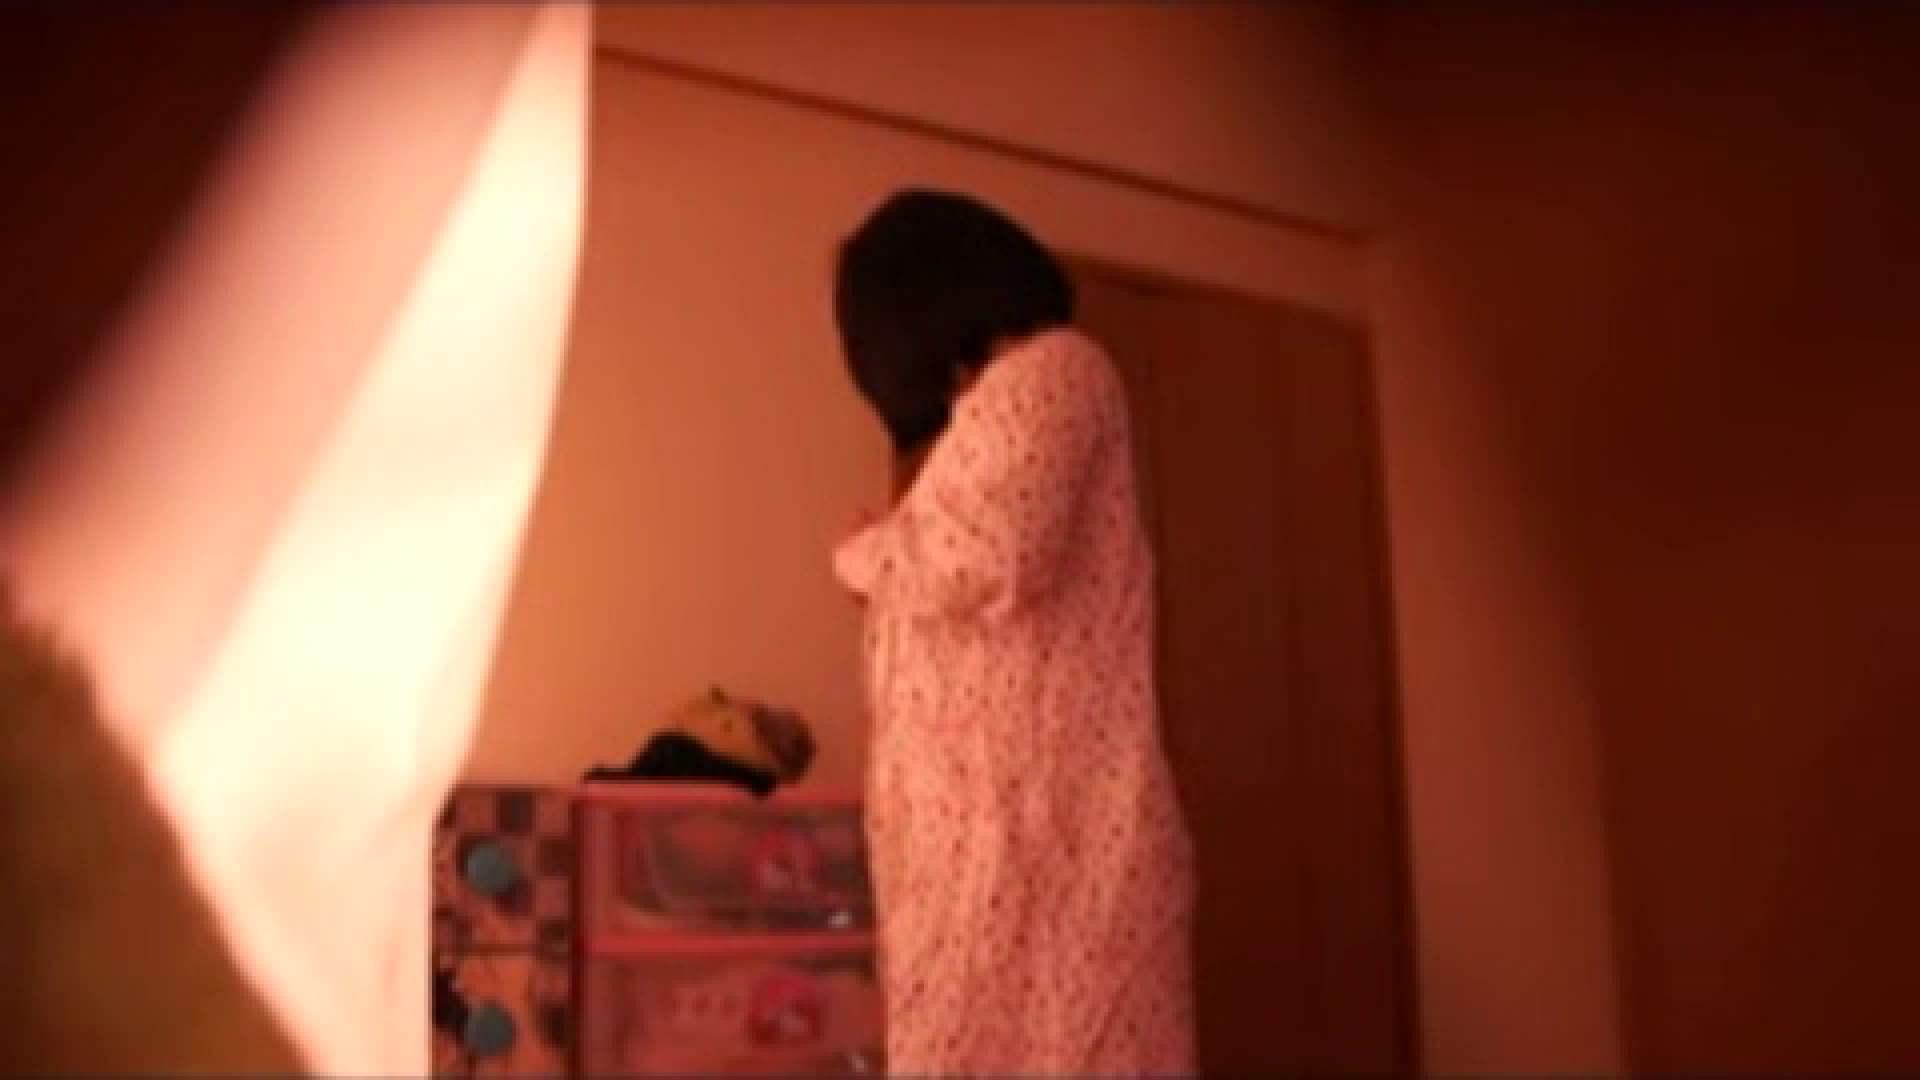 vol.2 まりこさんのお着替え、就寝前の映像です。 エッチすぎるOL達 | 着替えシーン  29連発 17